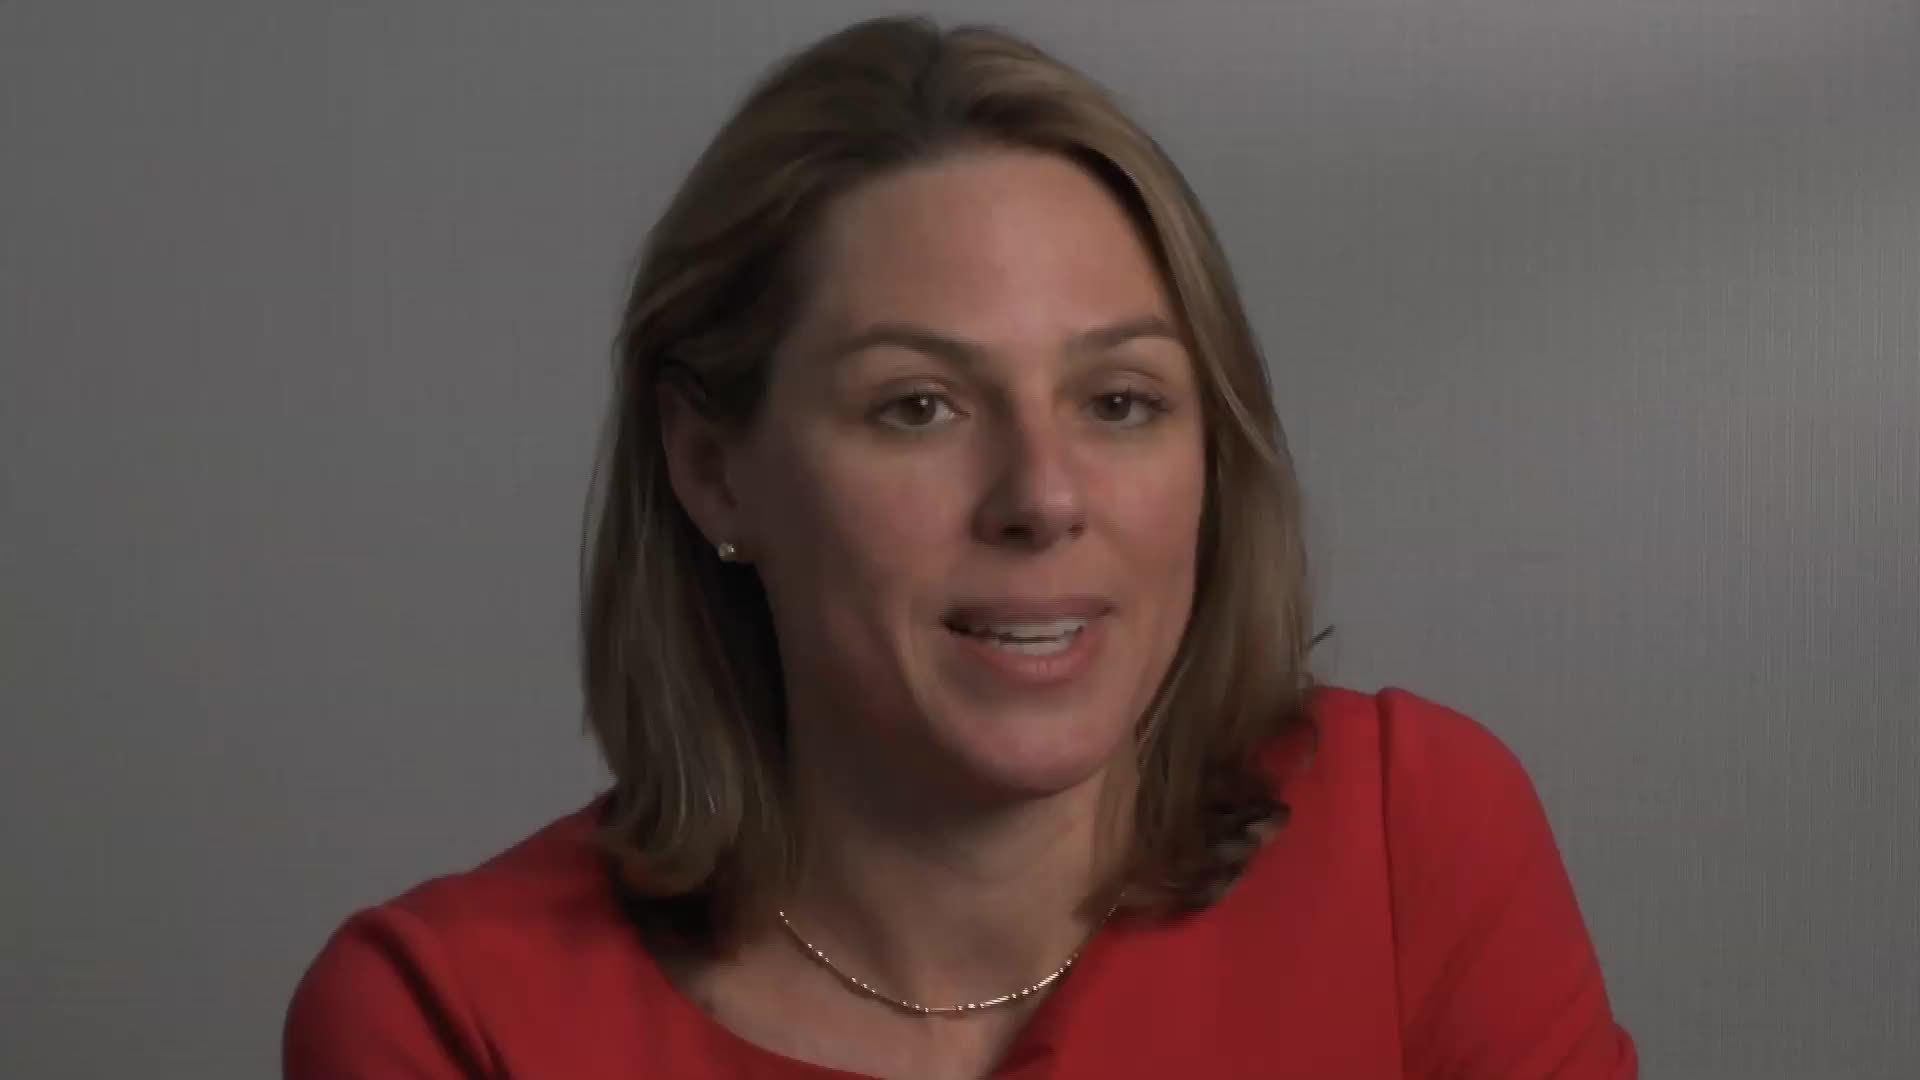 Landis Best describes her role as a mentor to associates.